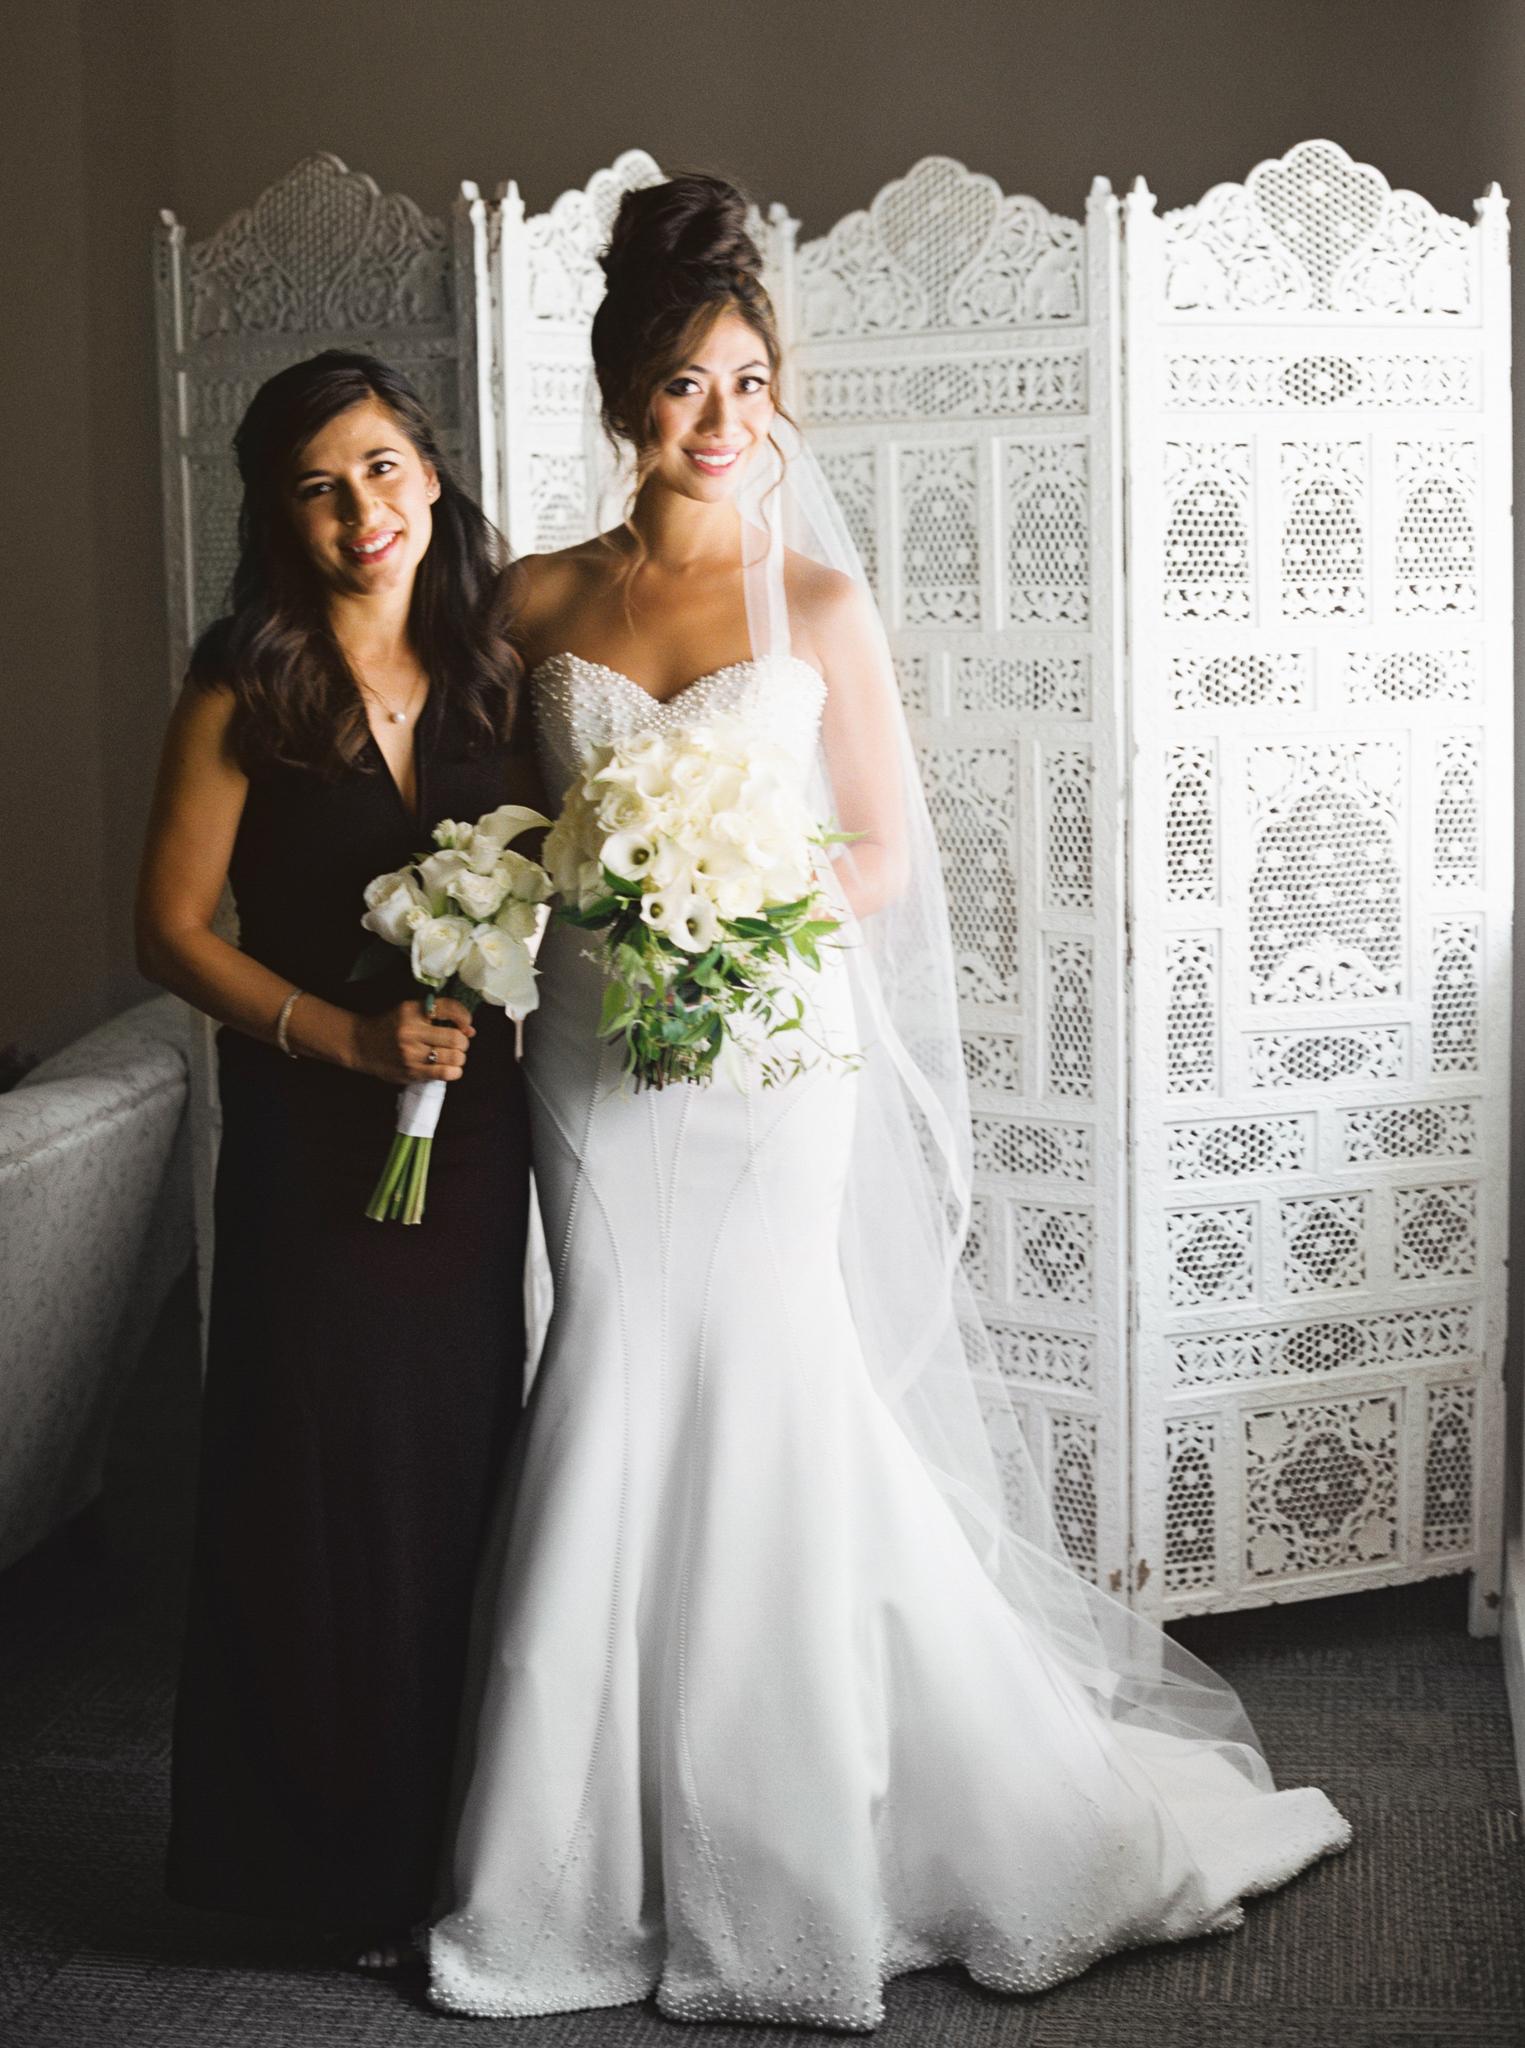 032OutliveCreative_Travel_Photographer_Videographer_Lewis&Clark_Oregon_Elegant_BlackTie_Destination_Wedding.jpg